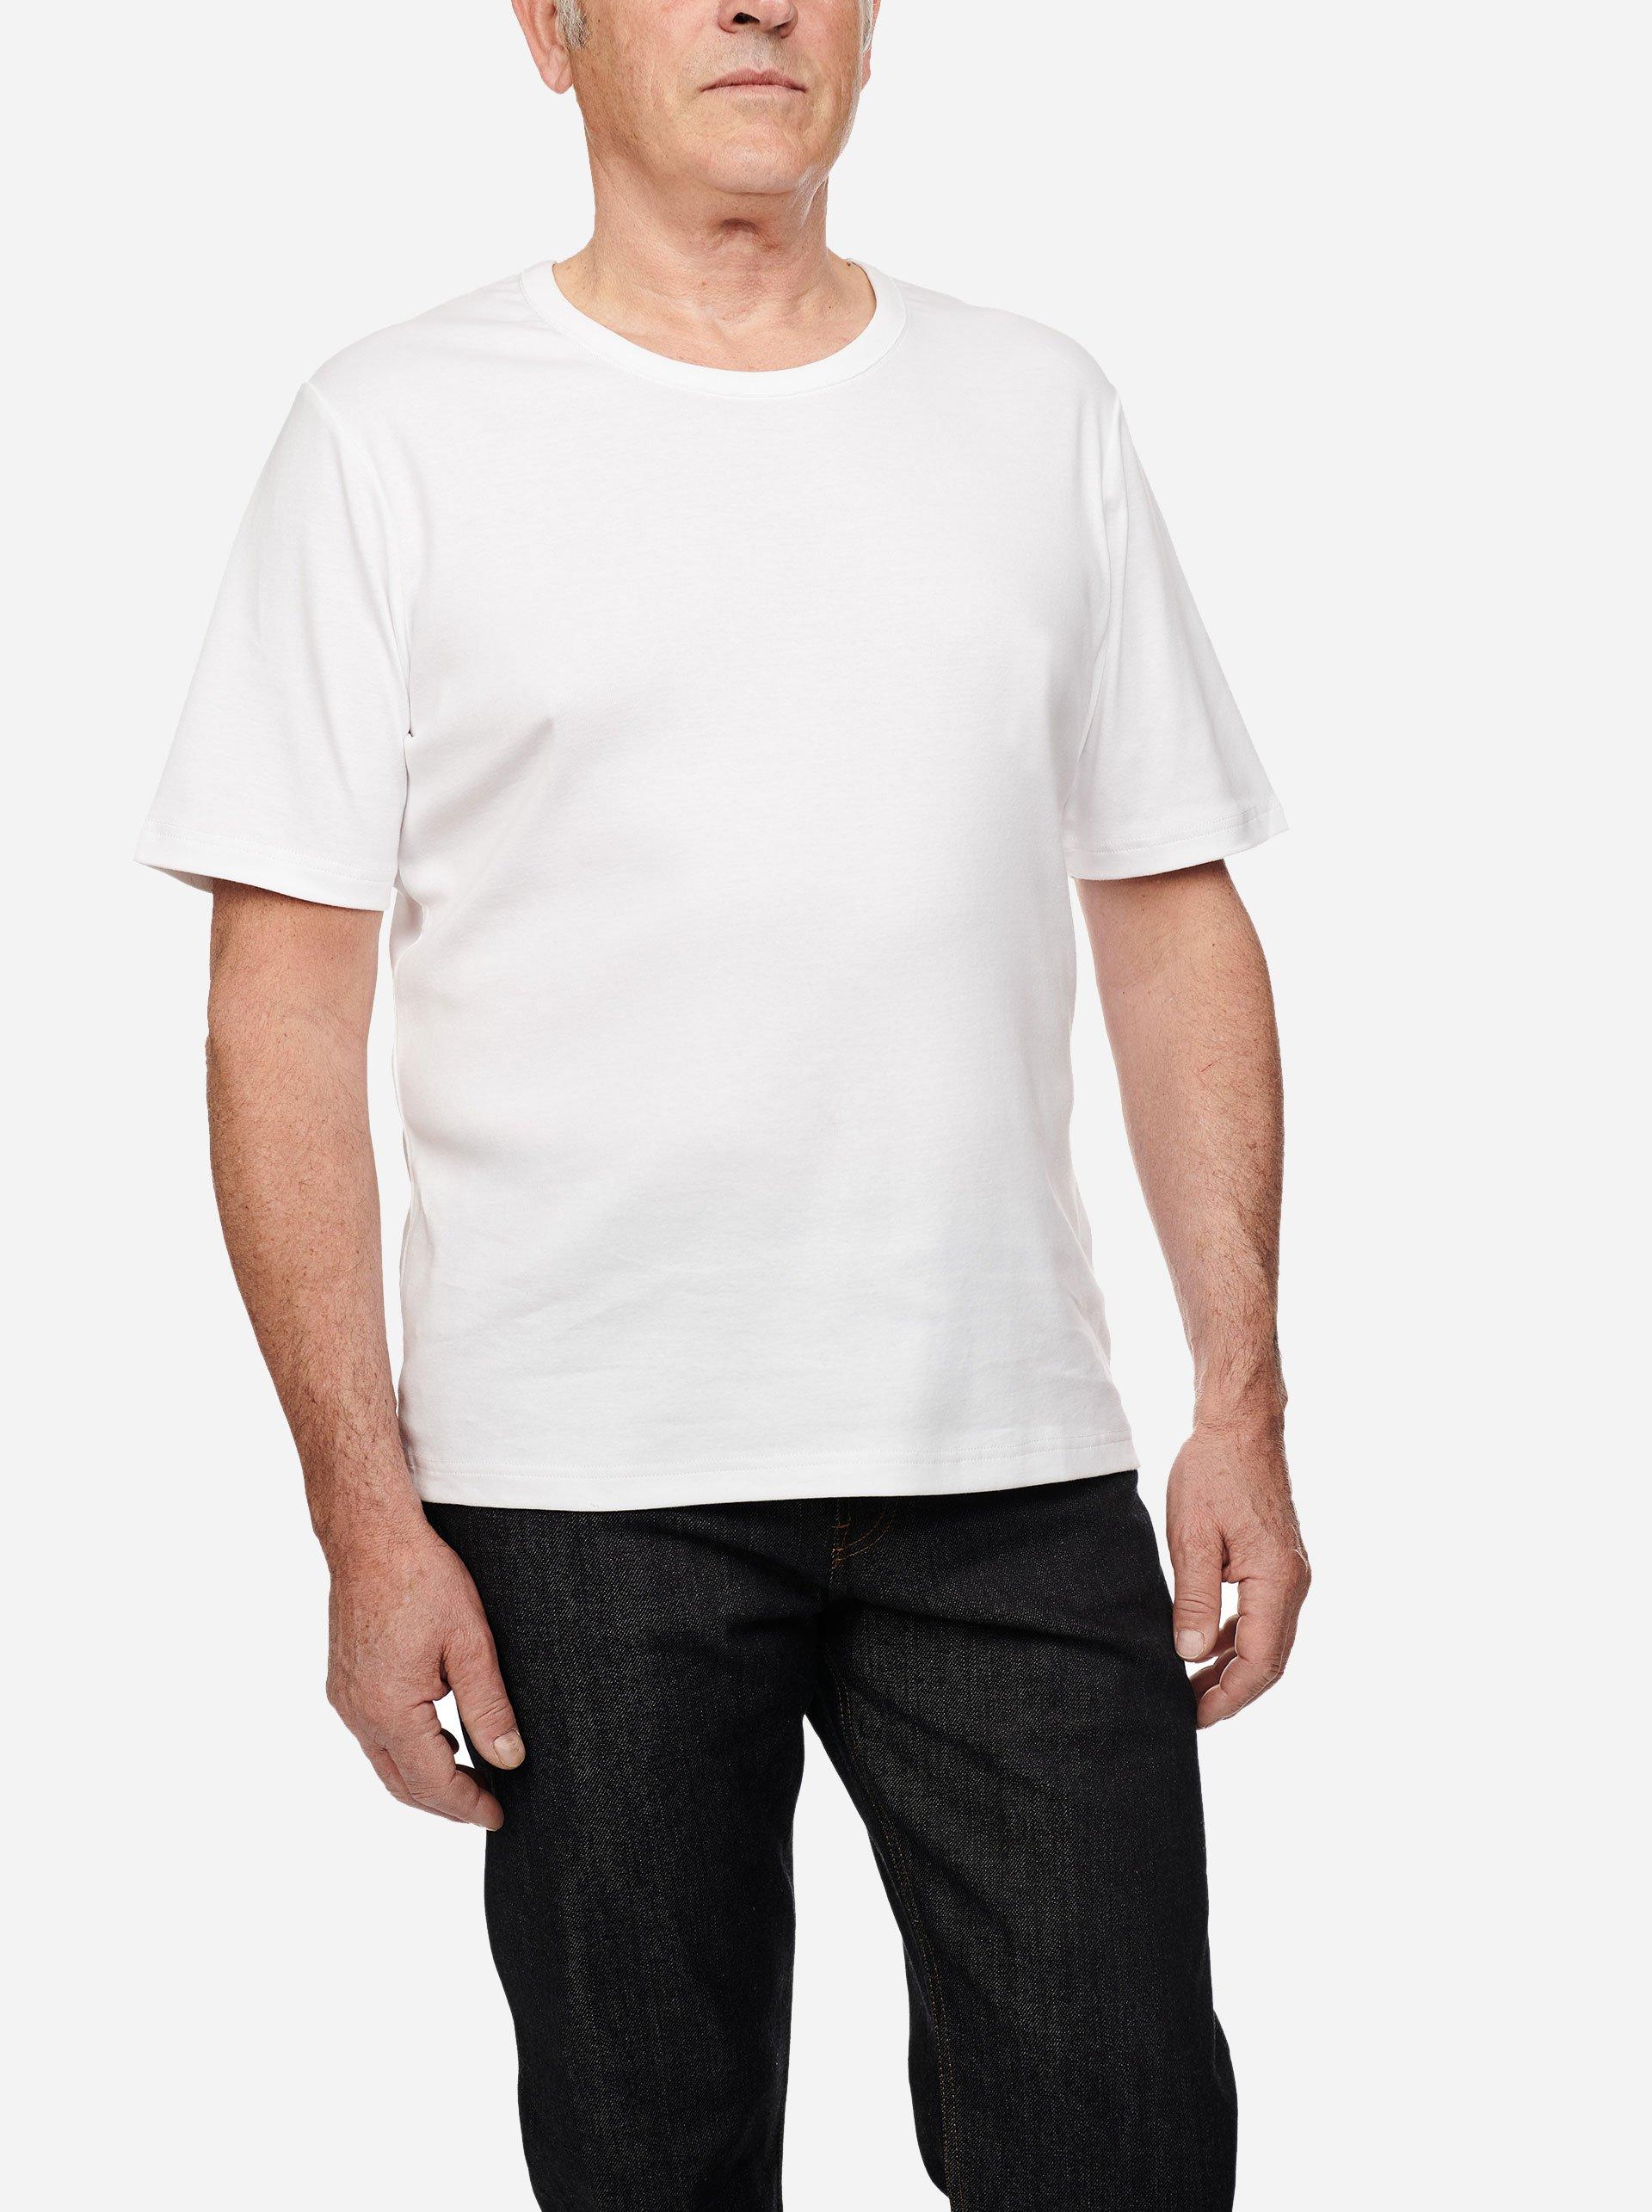 Teym_-_Size_Guide_-_T-shirt_-_Men_-_1